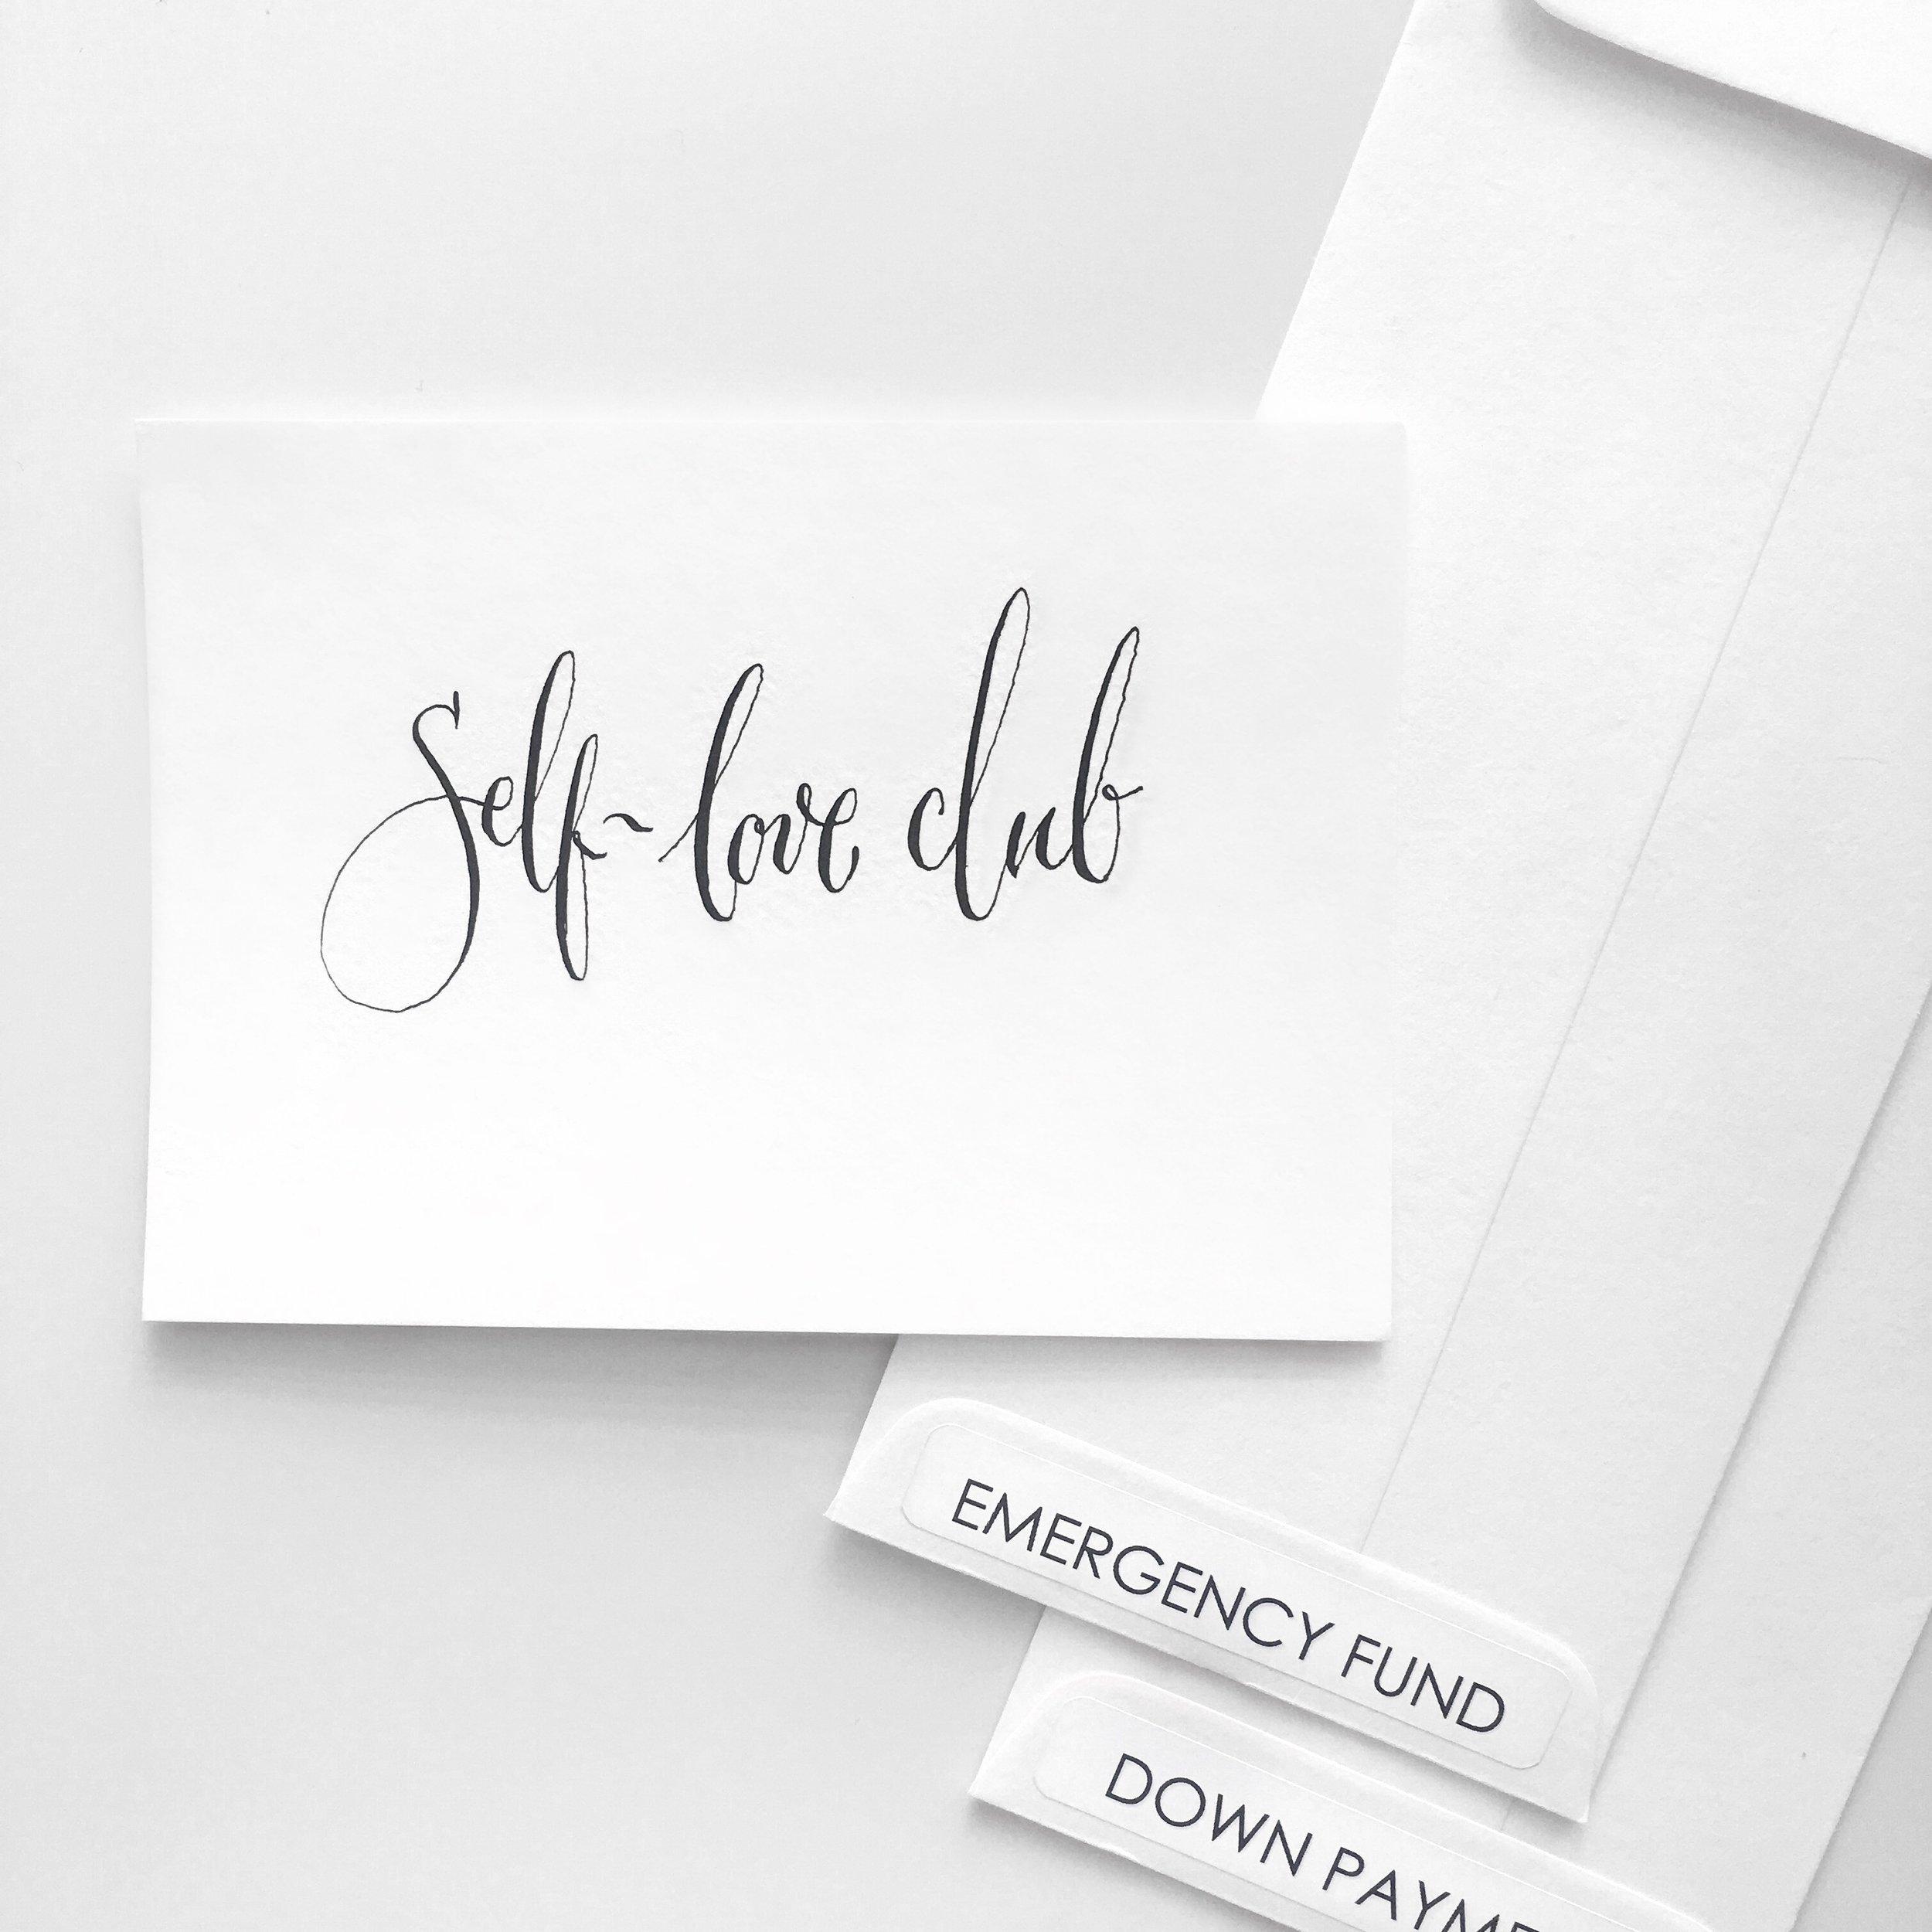 Self-love club. 💕